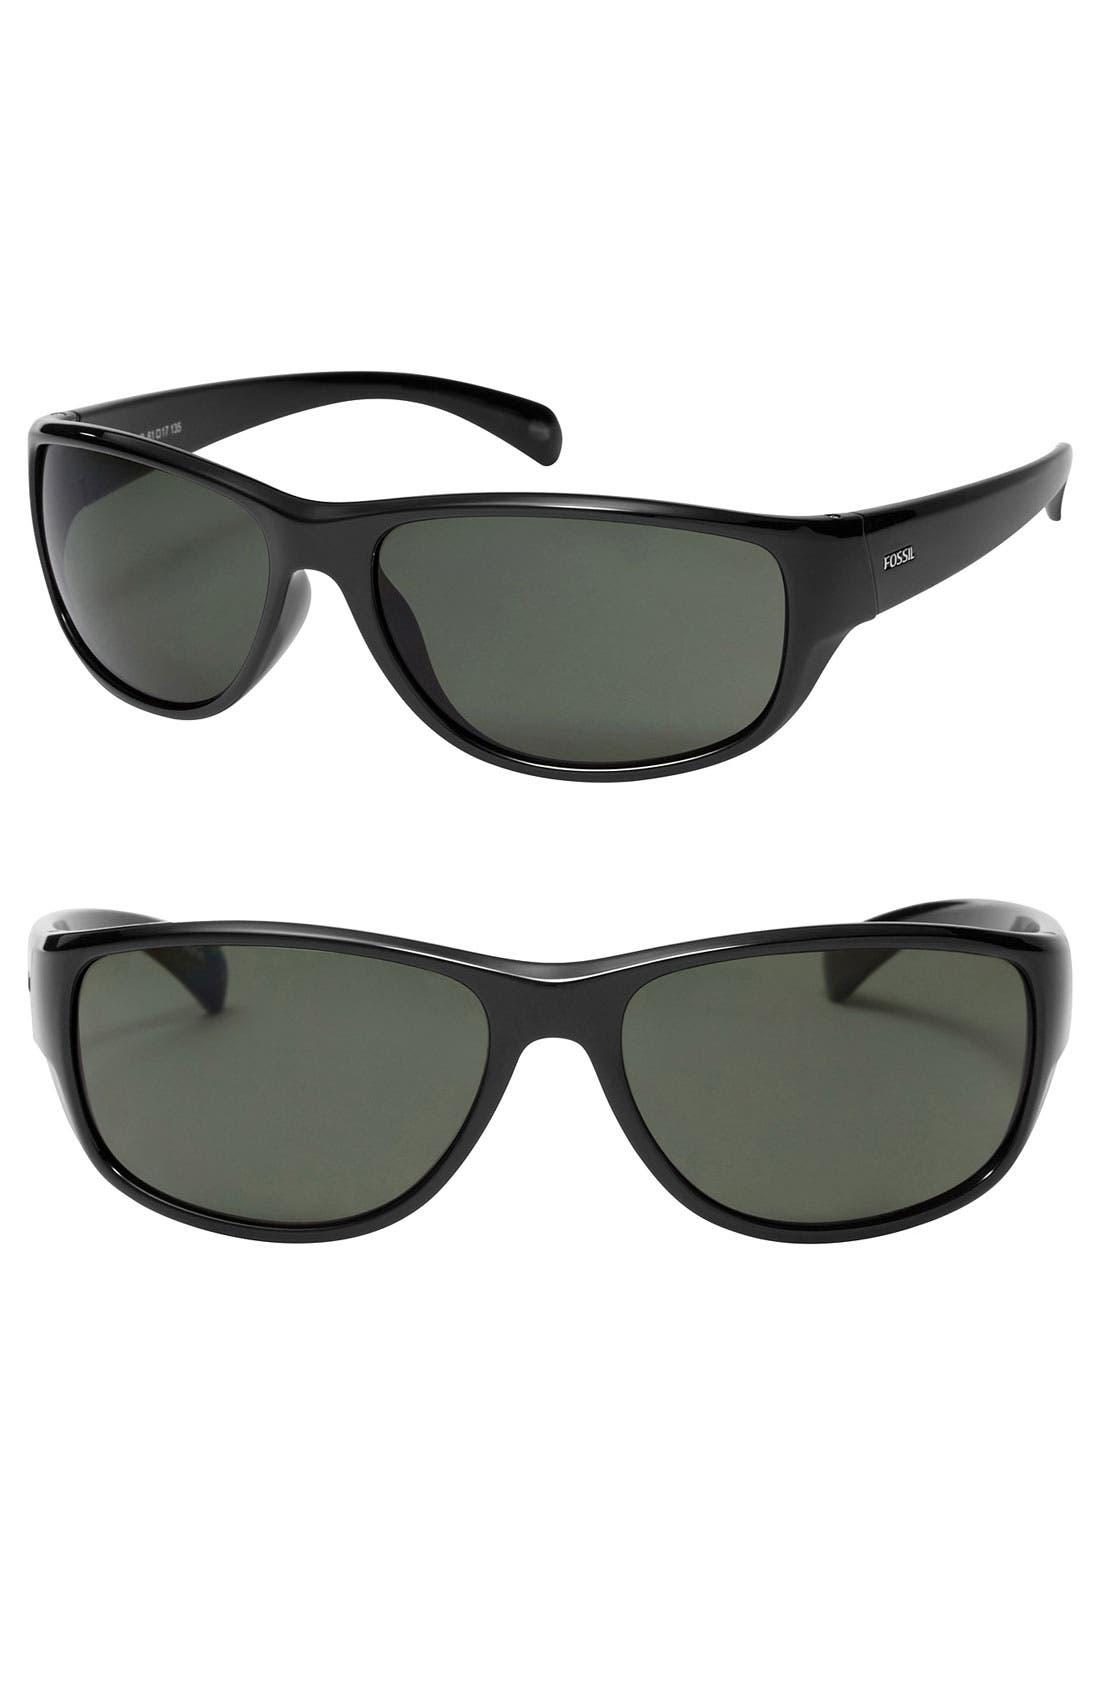 Main Image - Fossil 'Blake' 61mm Sunglasses